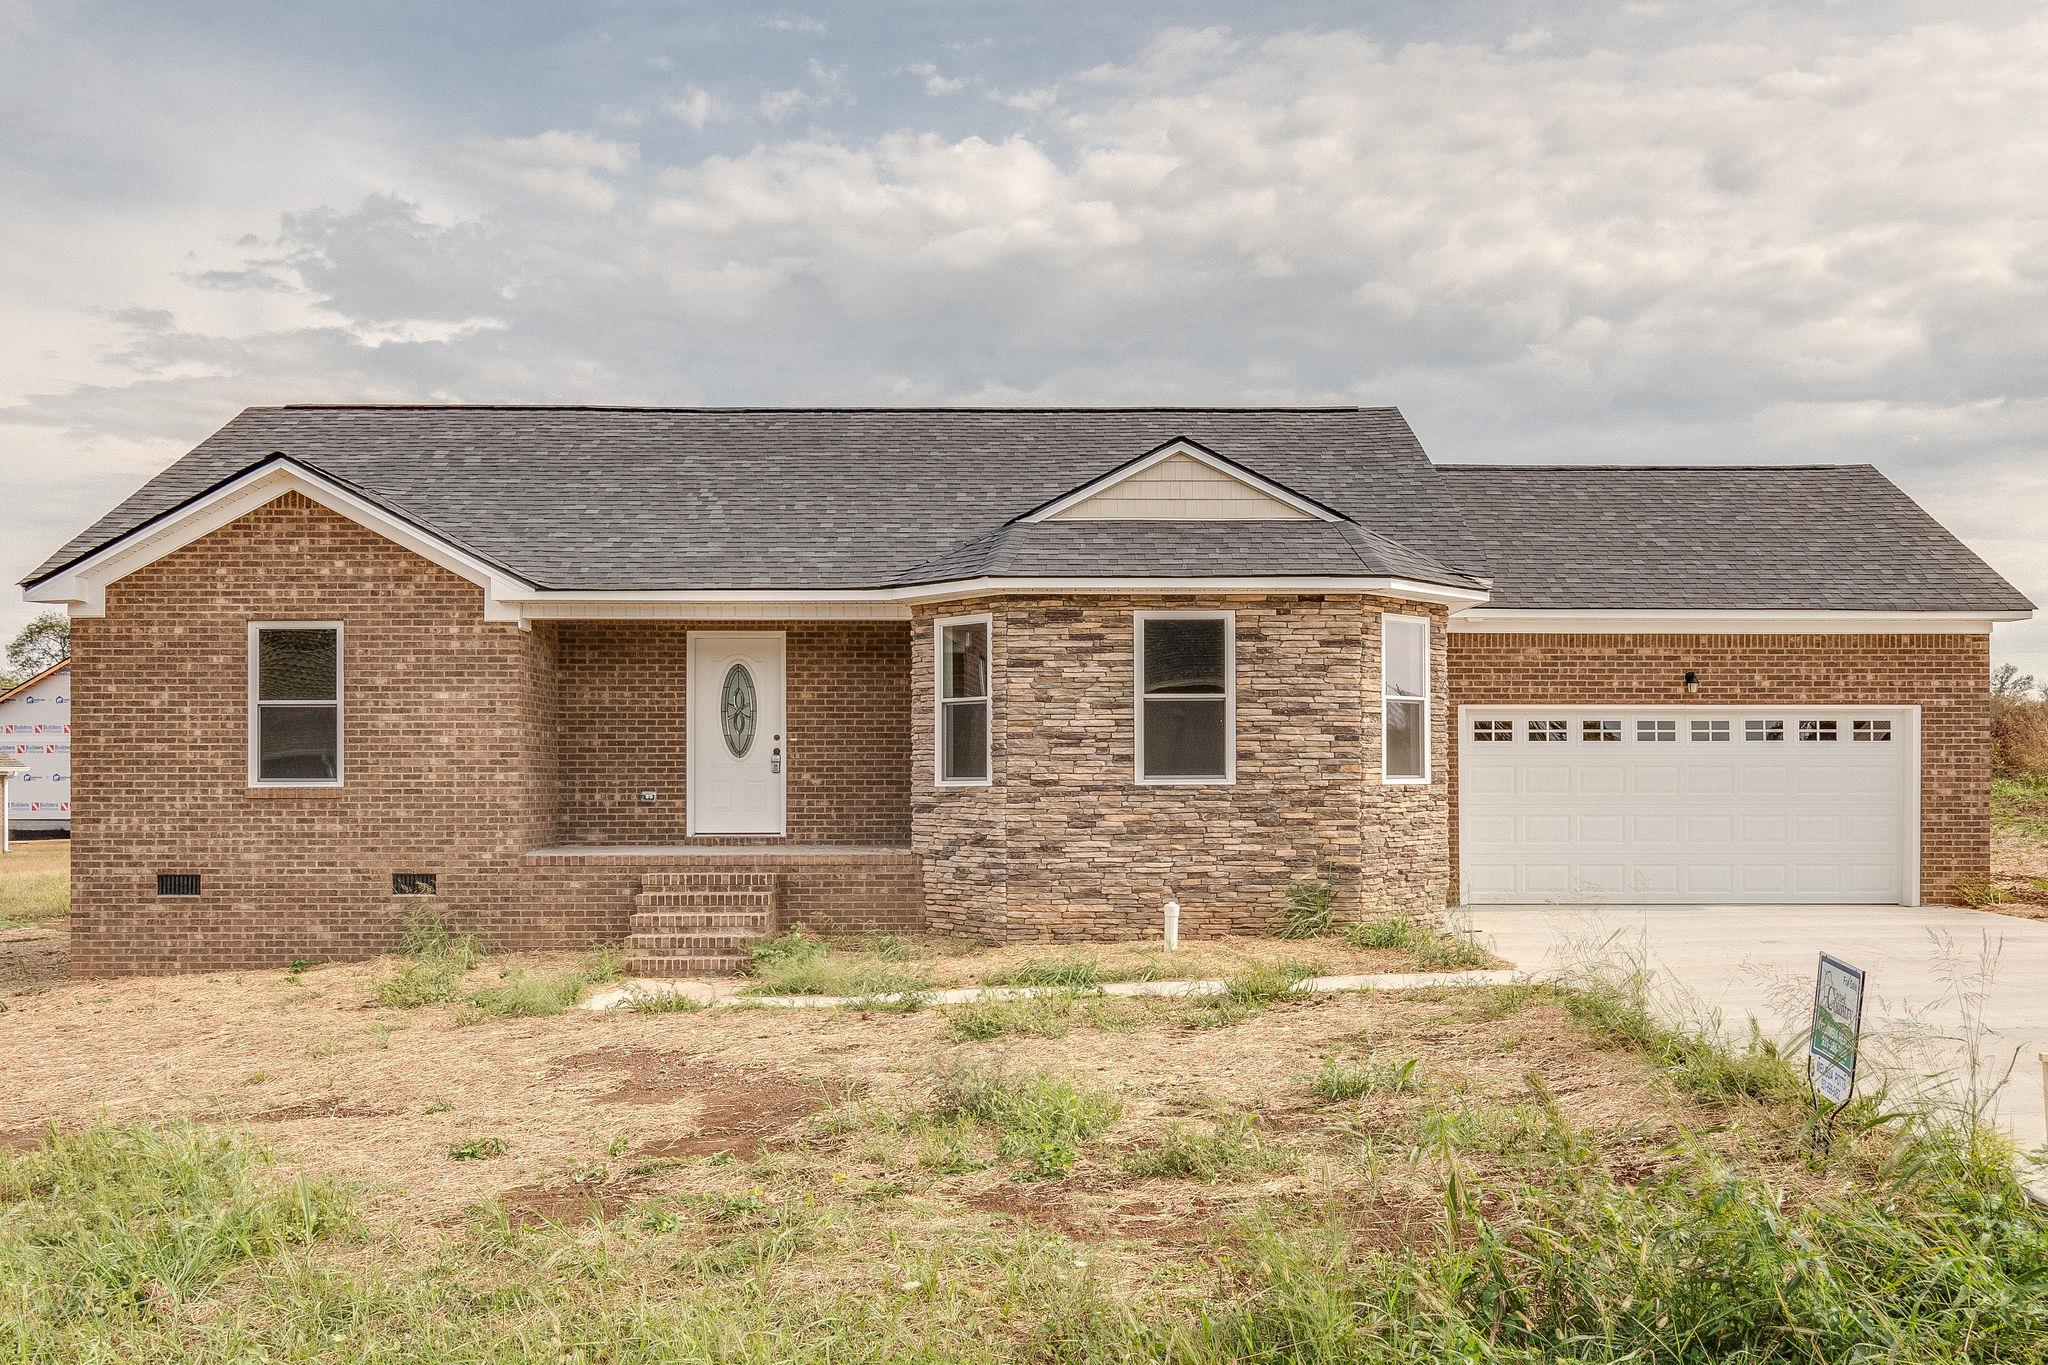 605 Brookside Dr, Mount Pleasant, TN 38474 - Mount Pleasant, TN real estate listing